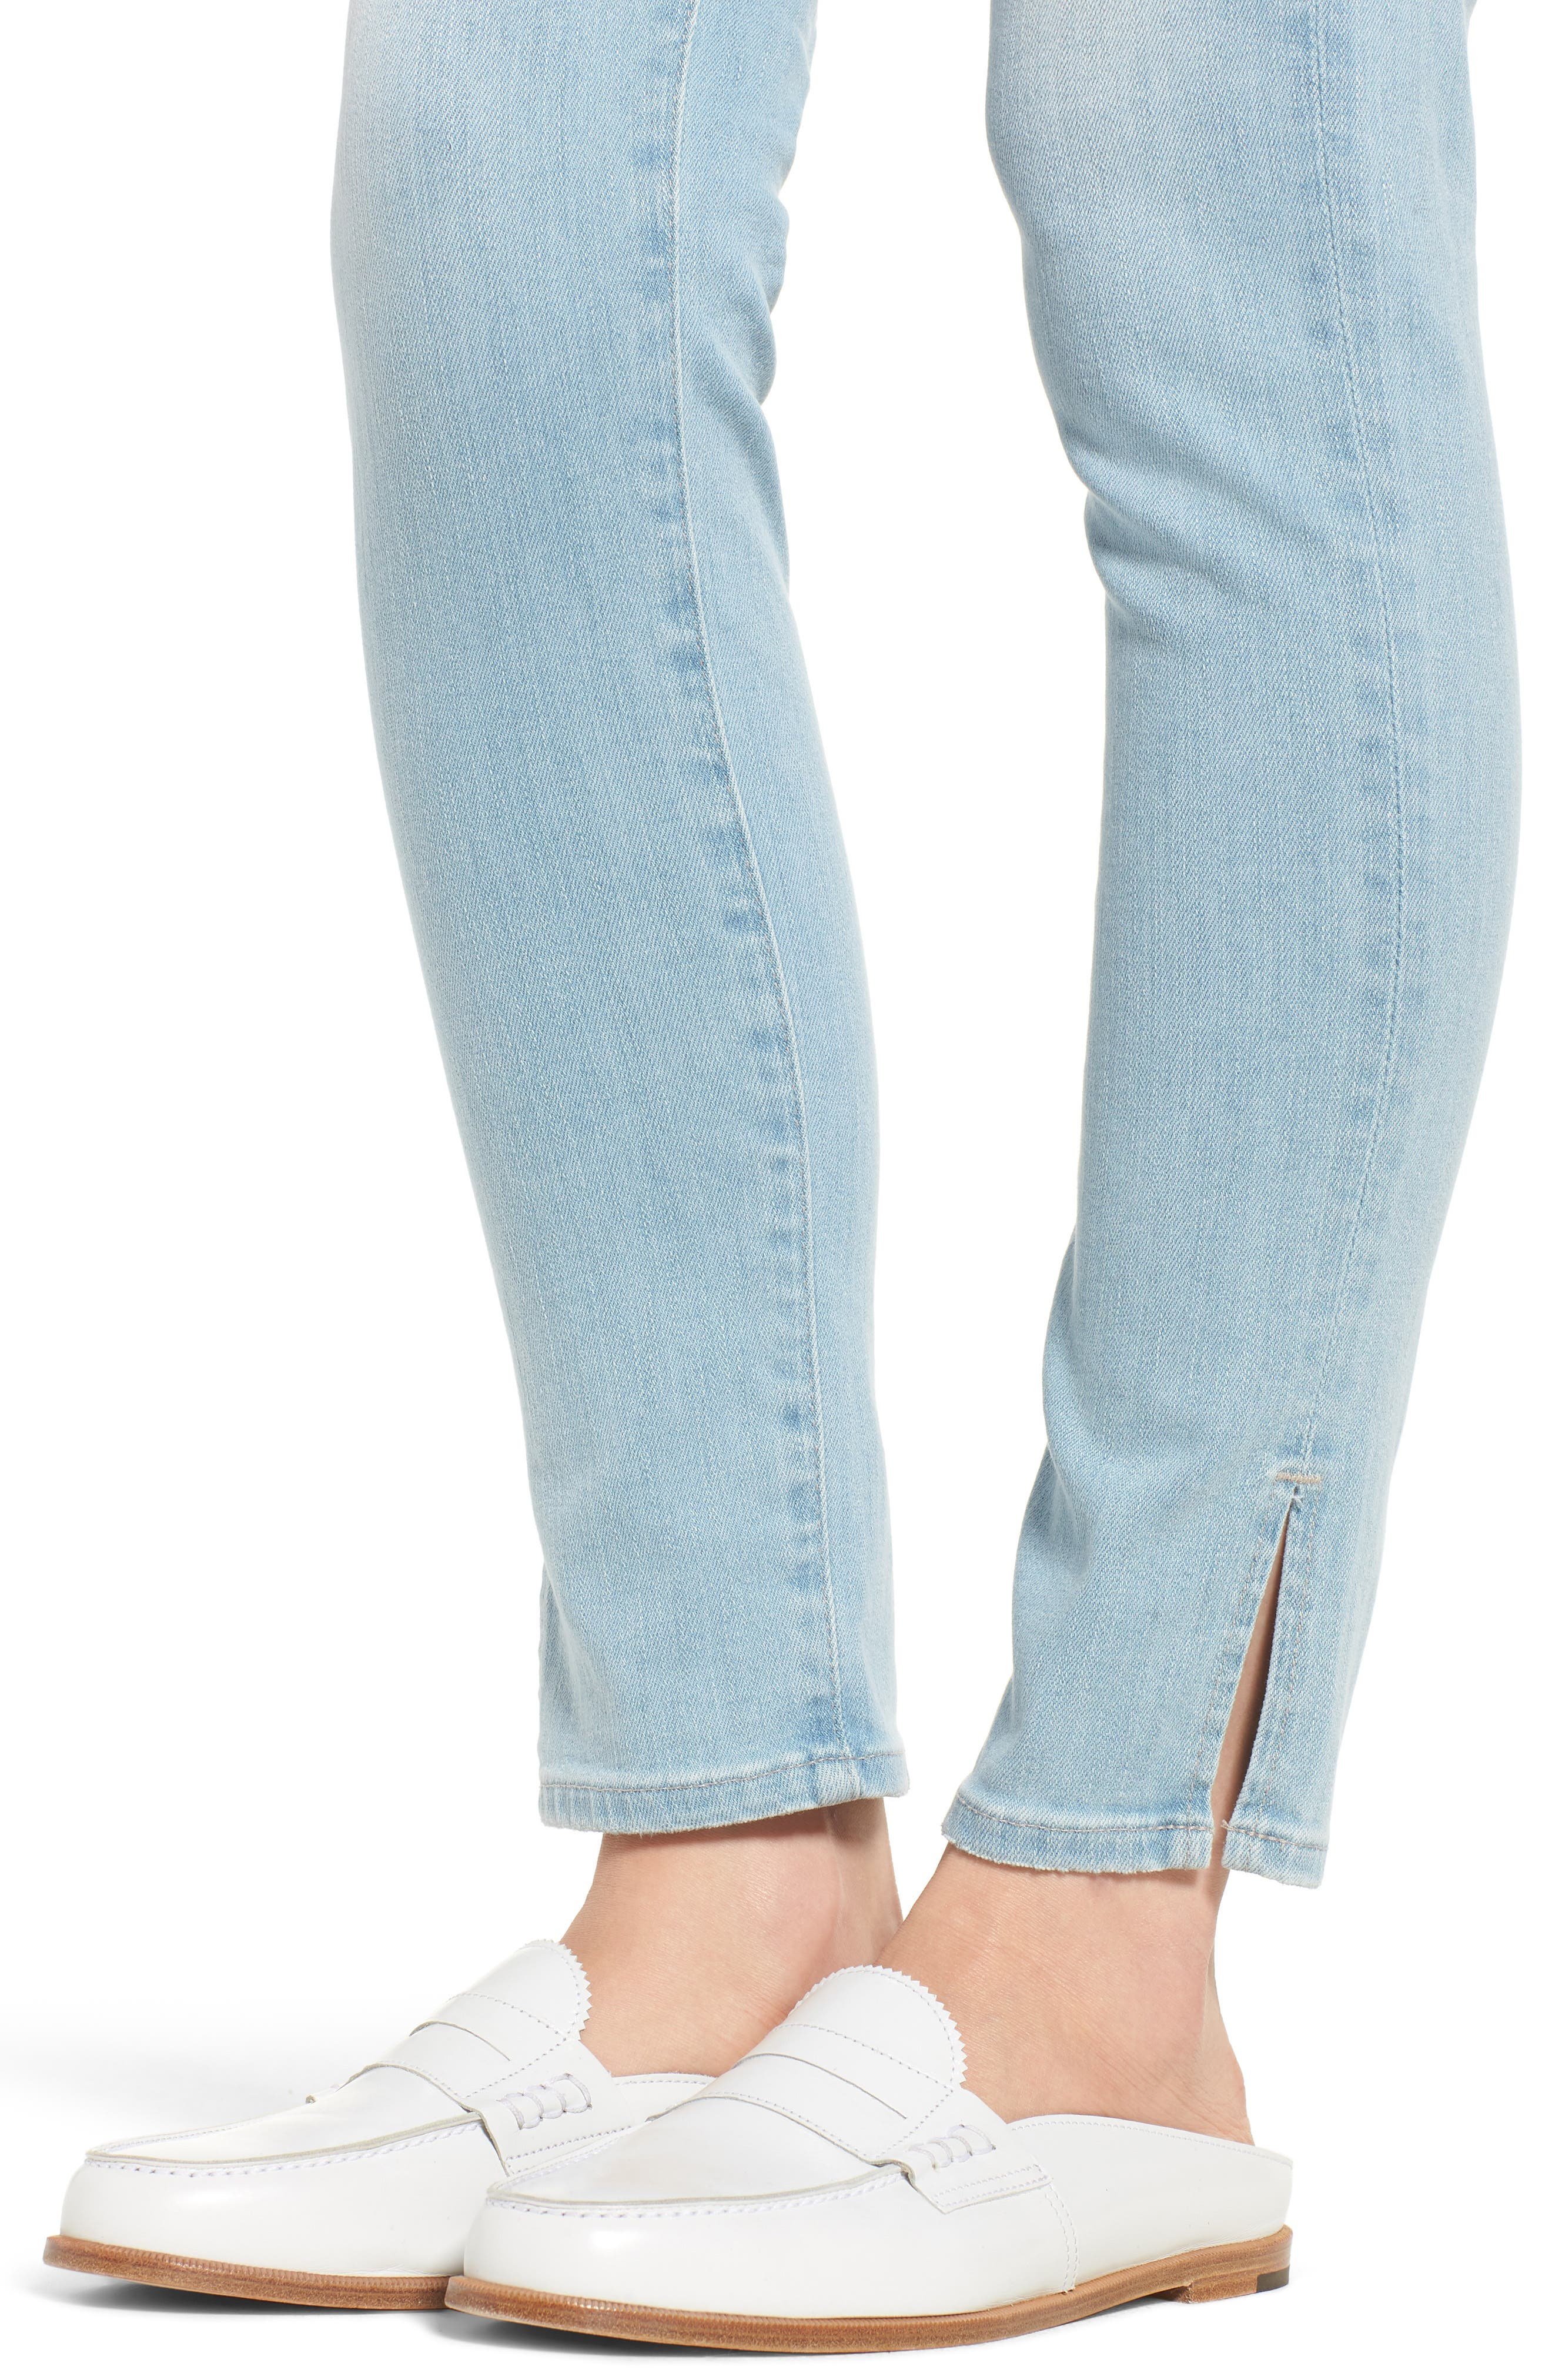 Farrah High Waist Ankle Skinny Jeans,                             Alternate thumbnail 4, color,                             20 Years Sutro